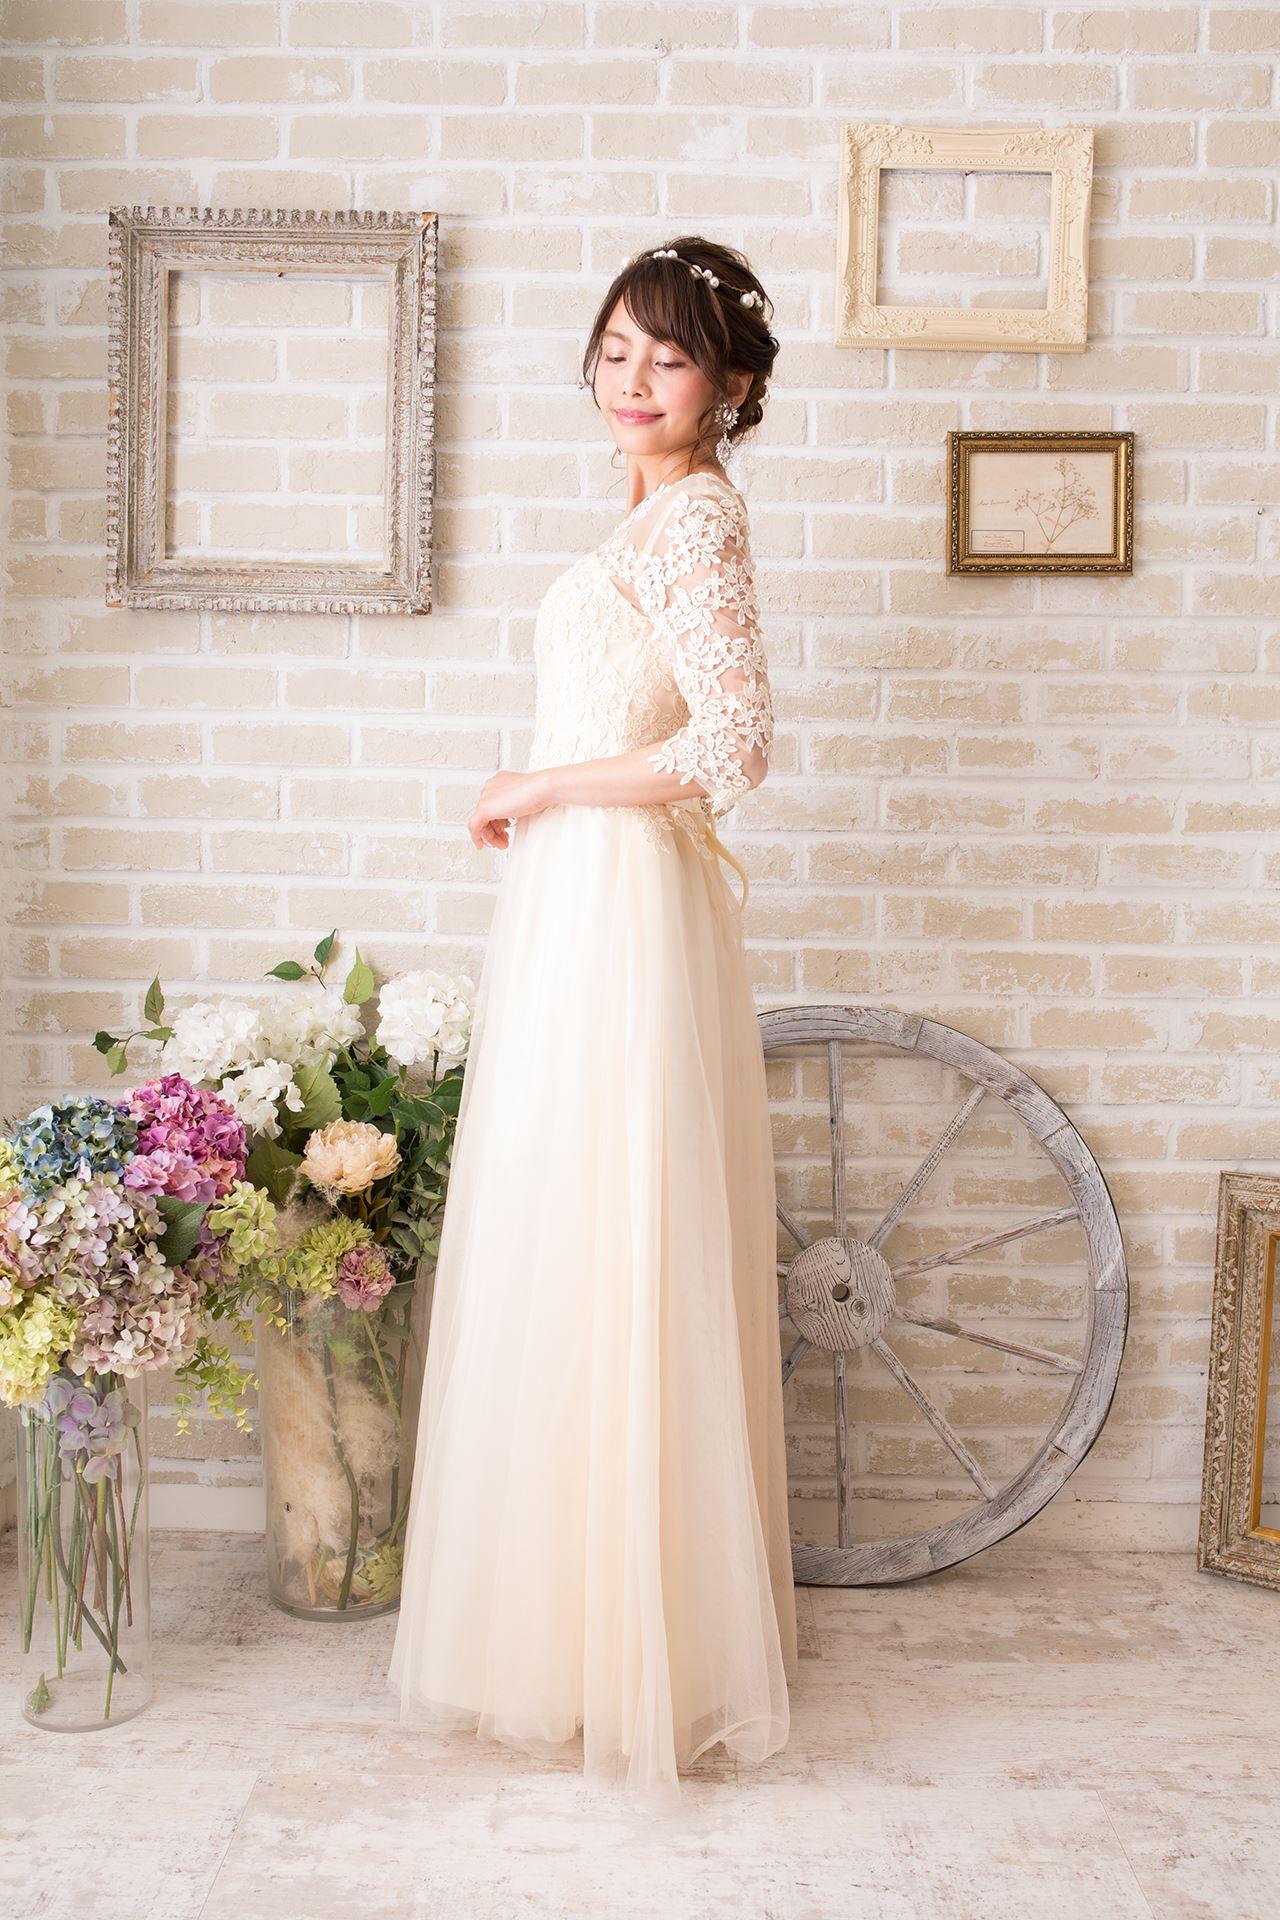 yk_nr_dress_377